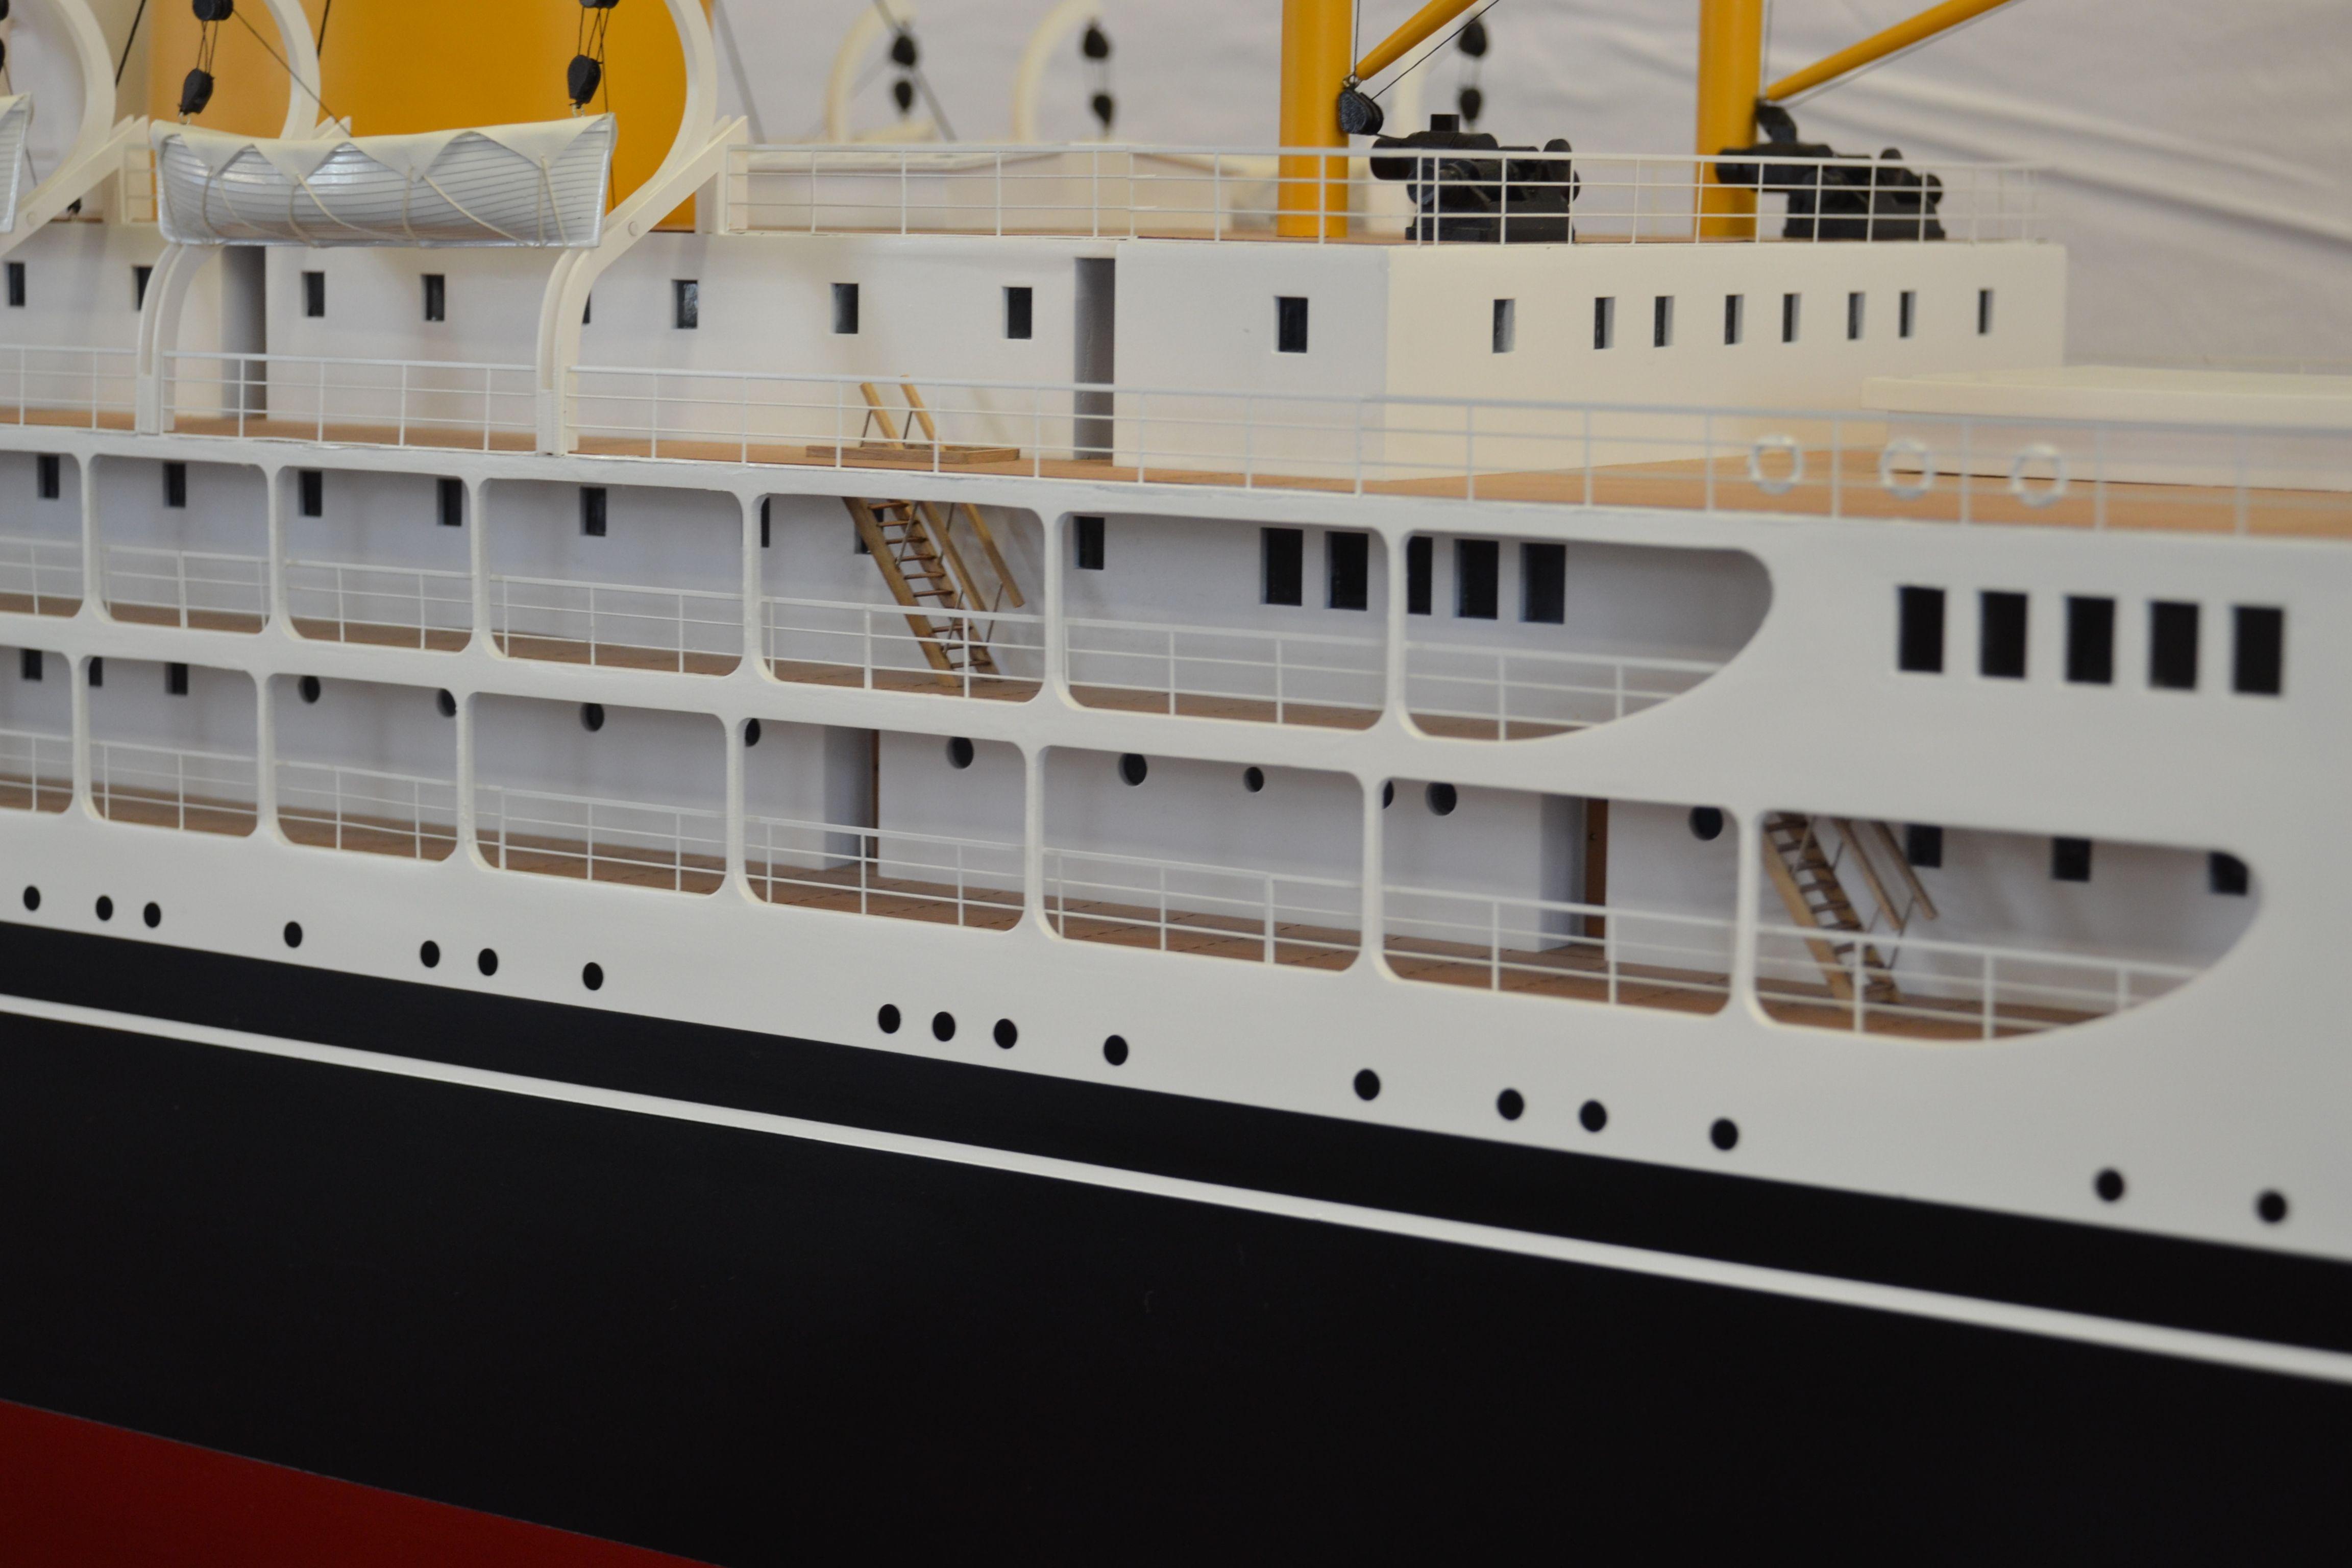 2209-12953-SS-Corinthic-Model-Ship